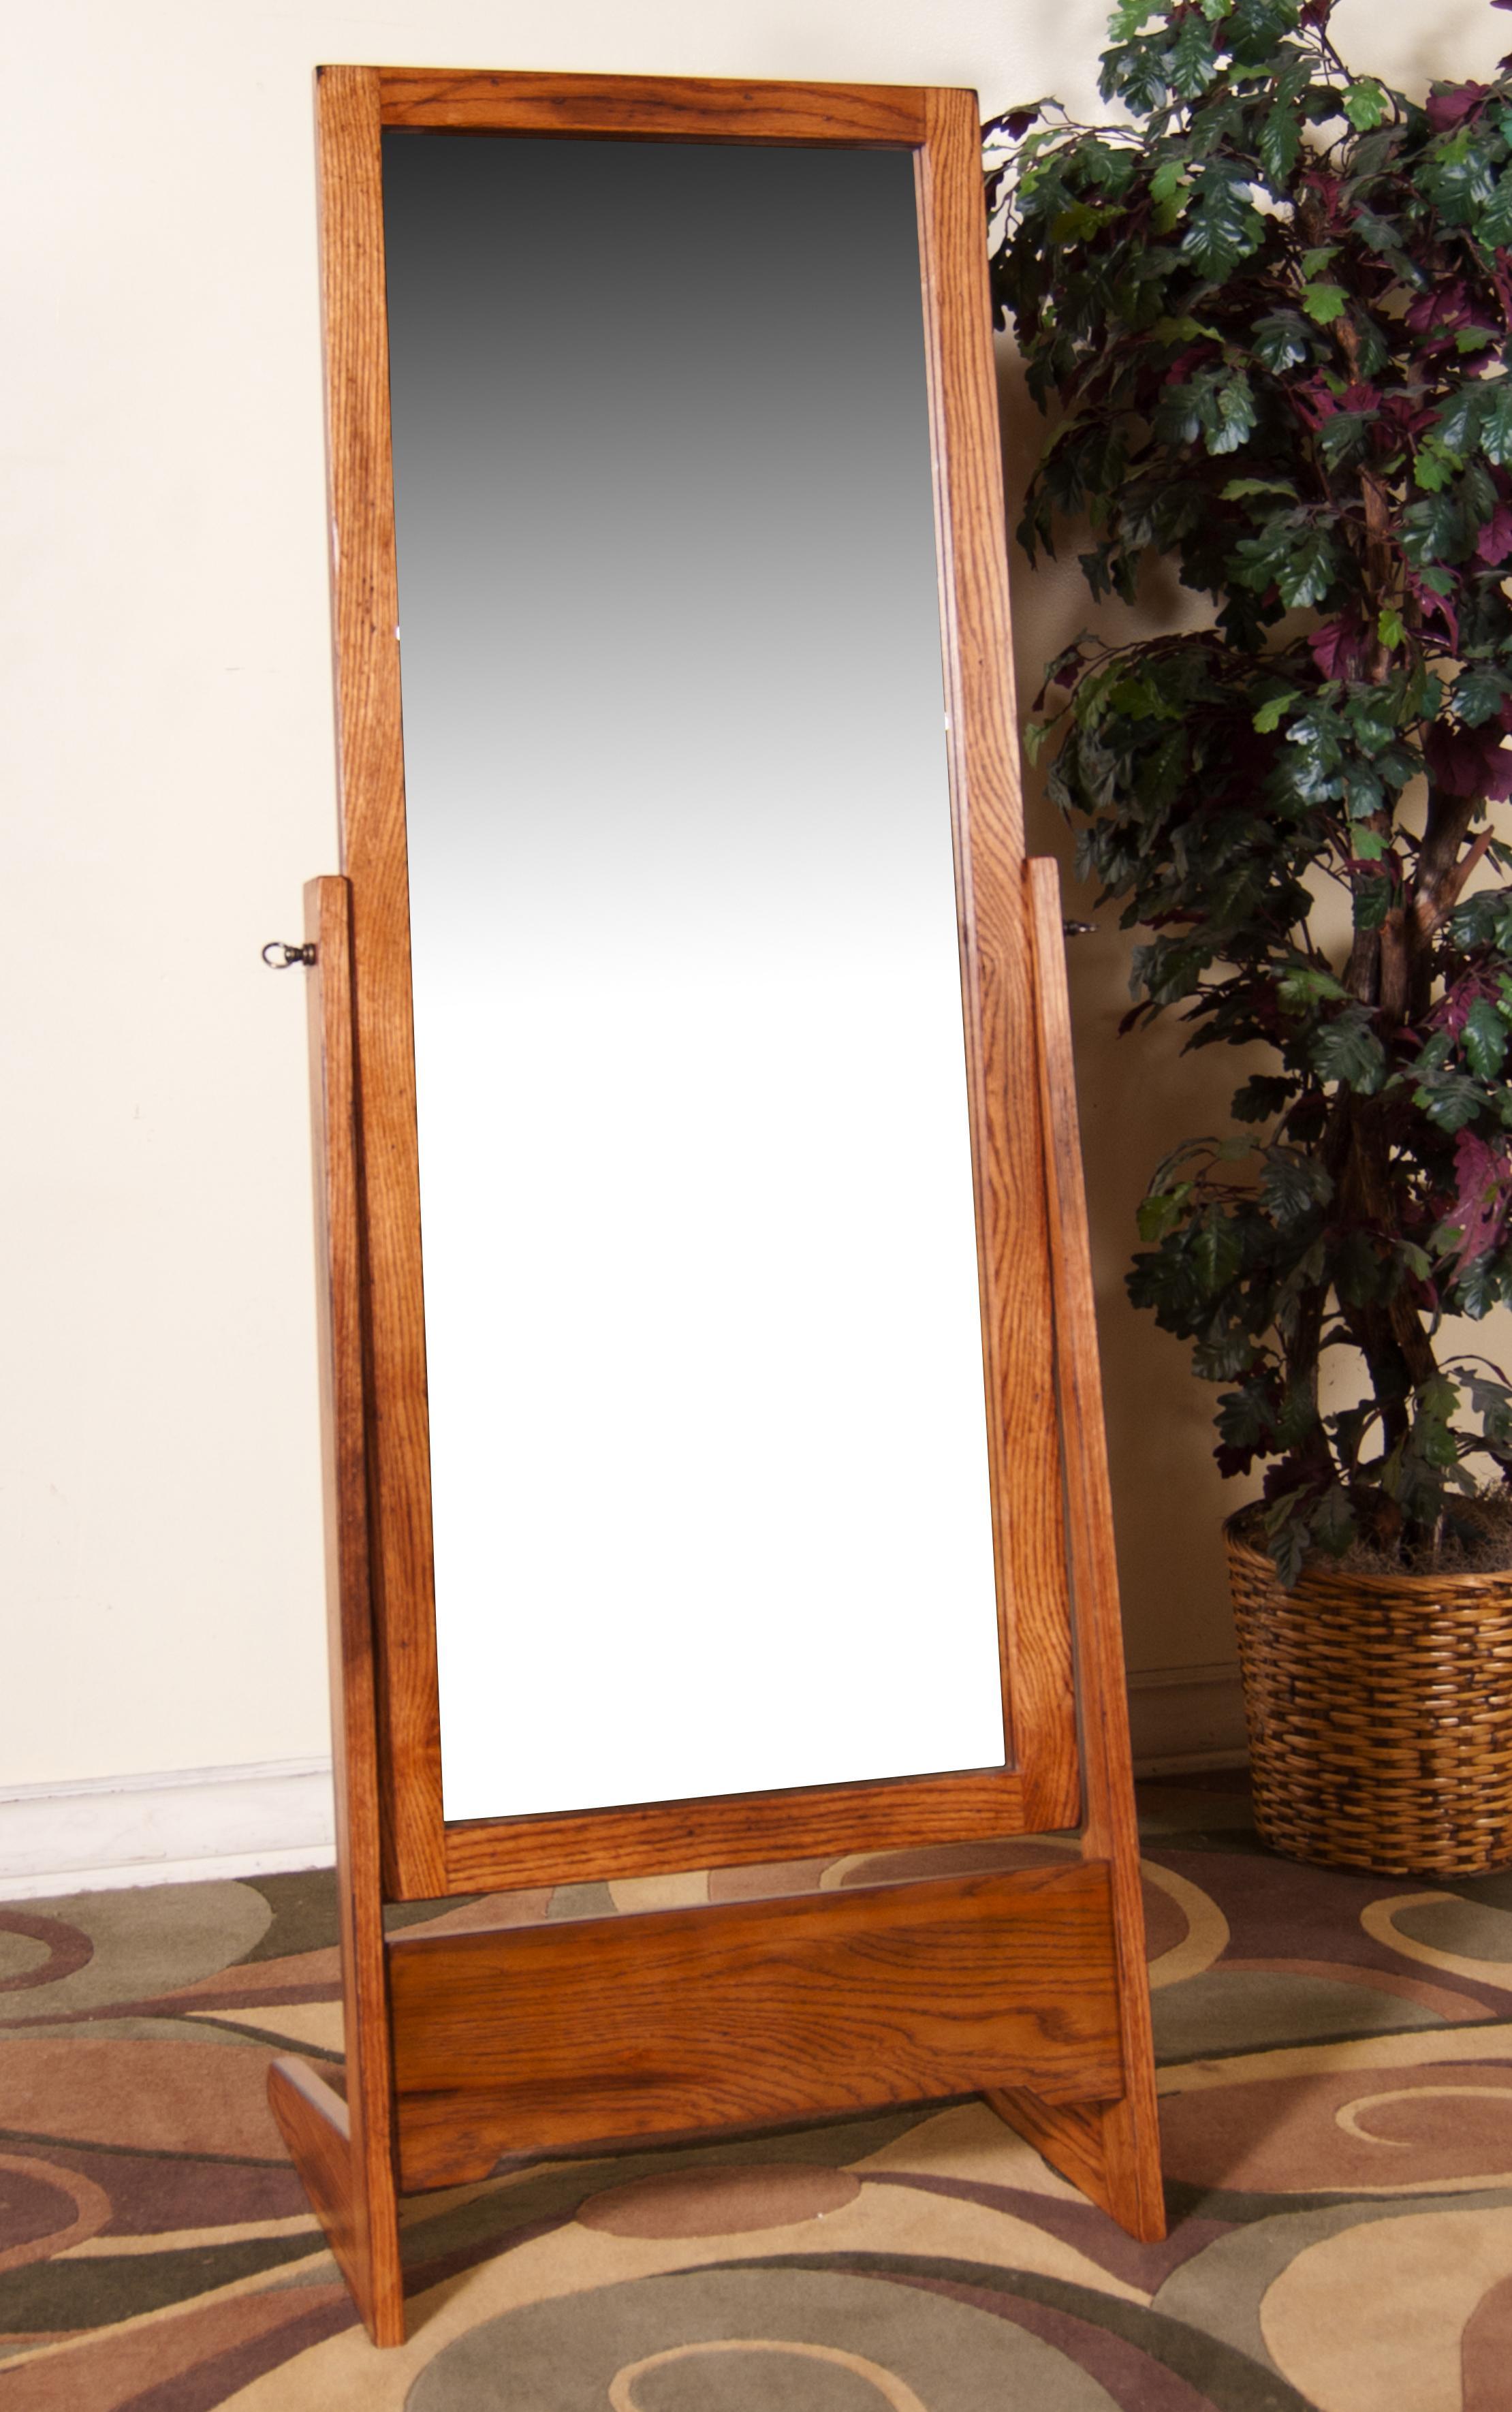 Morris Home Furnishings From Morris Home Furnishings - Cheval Mirror - Item Number: 2205RO